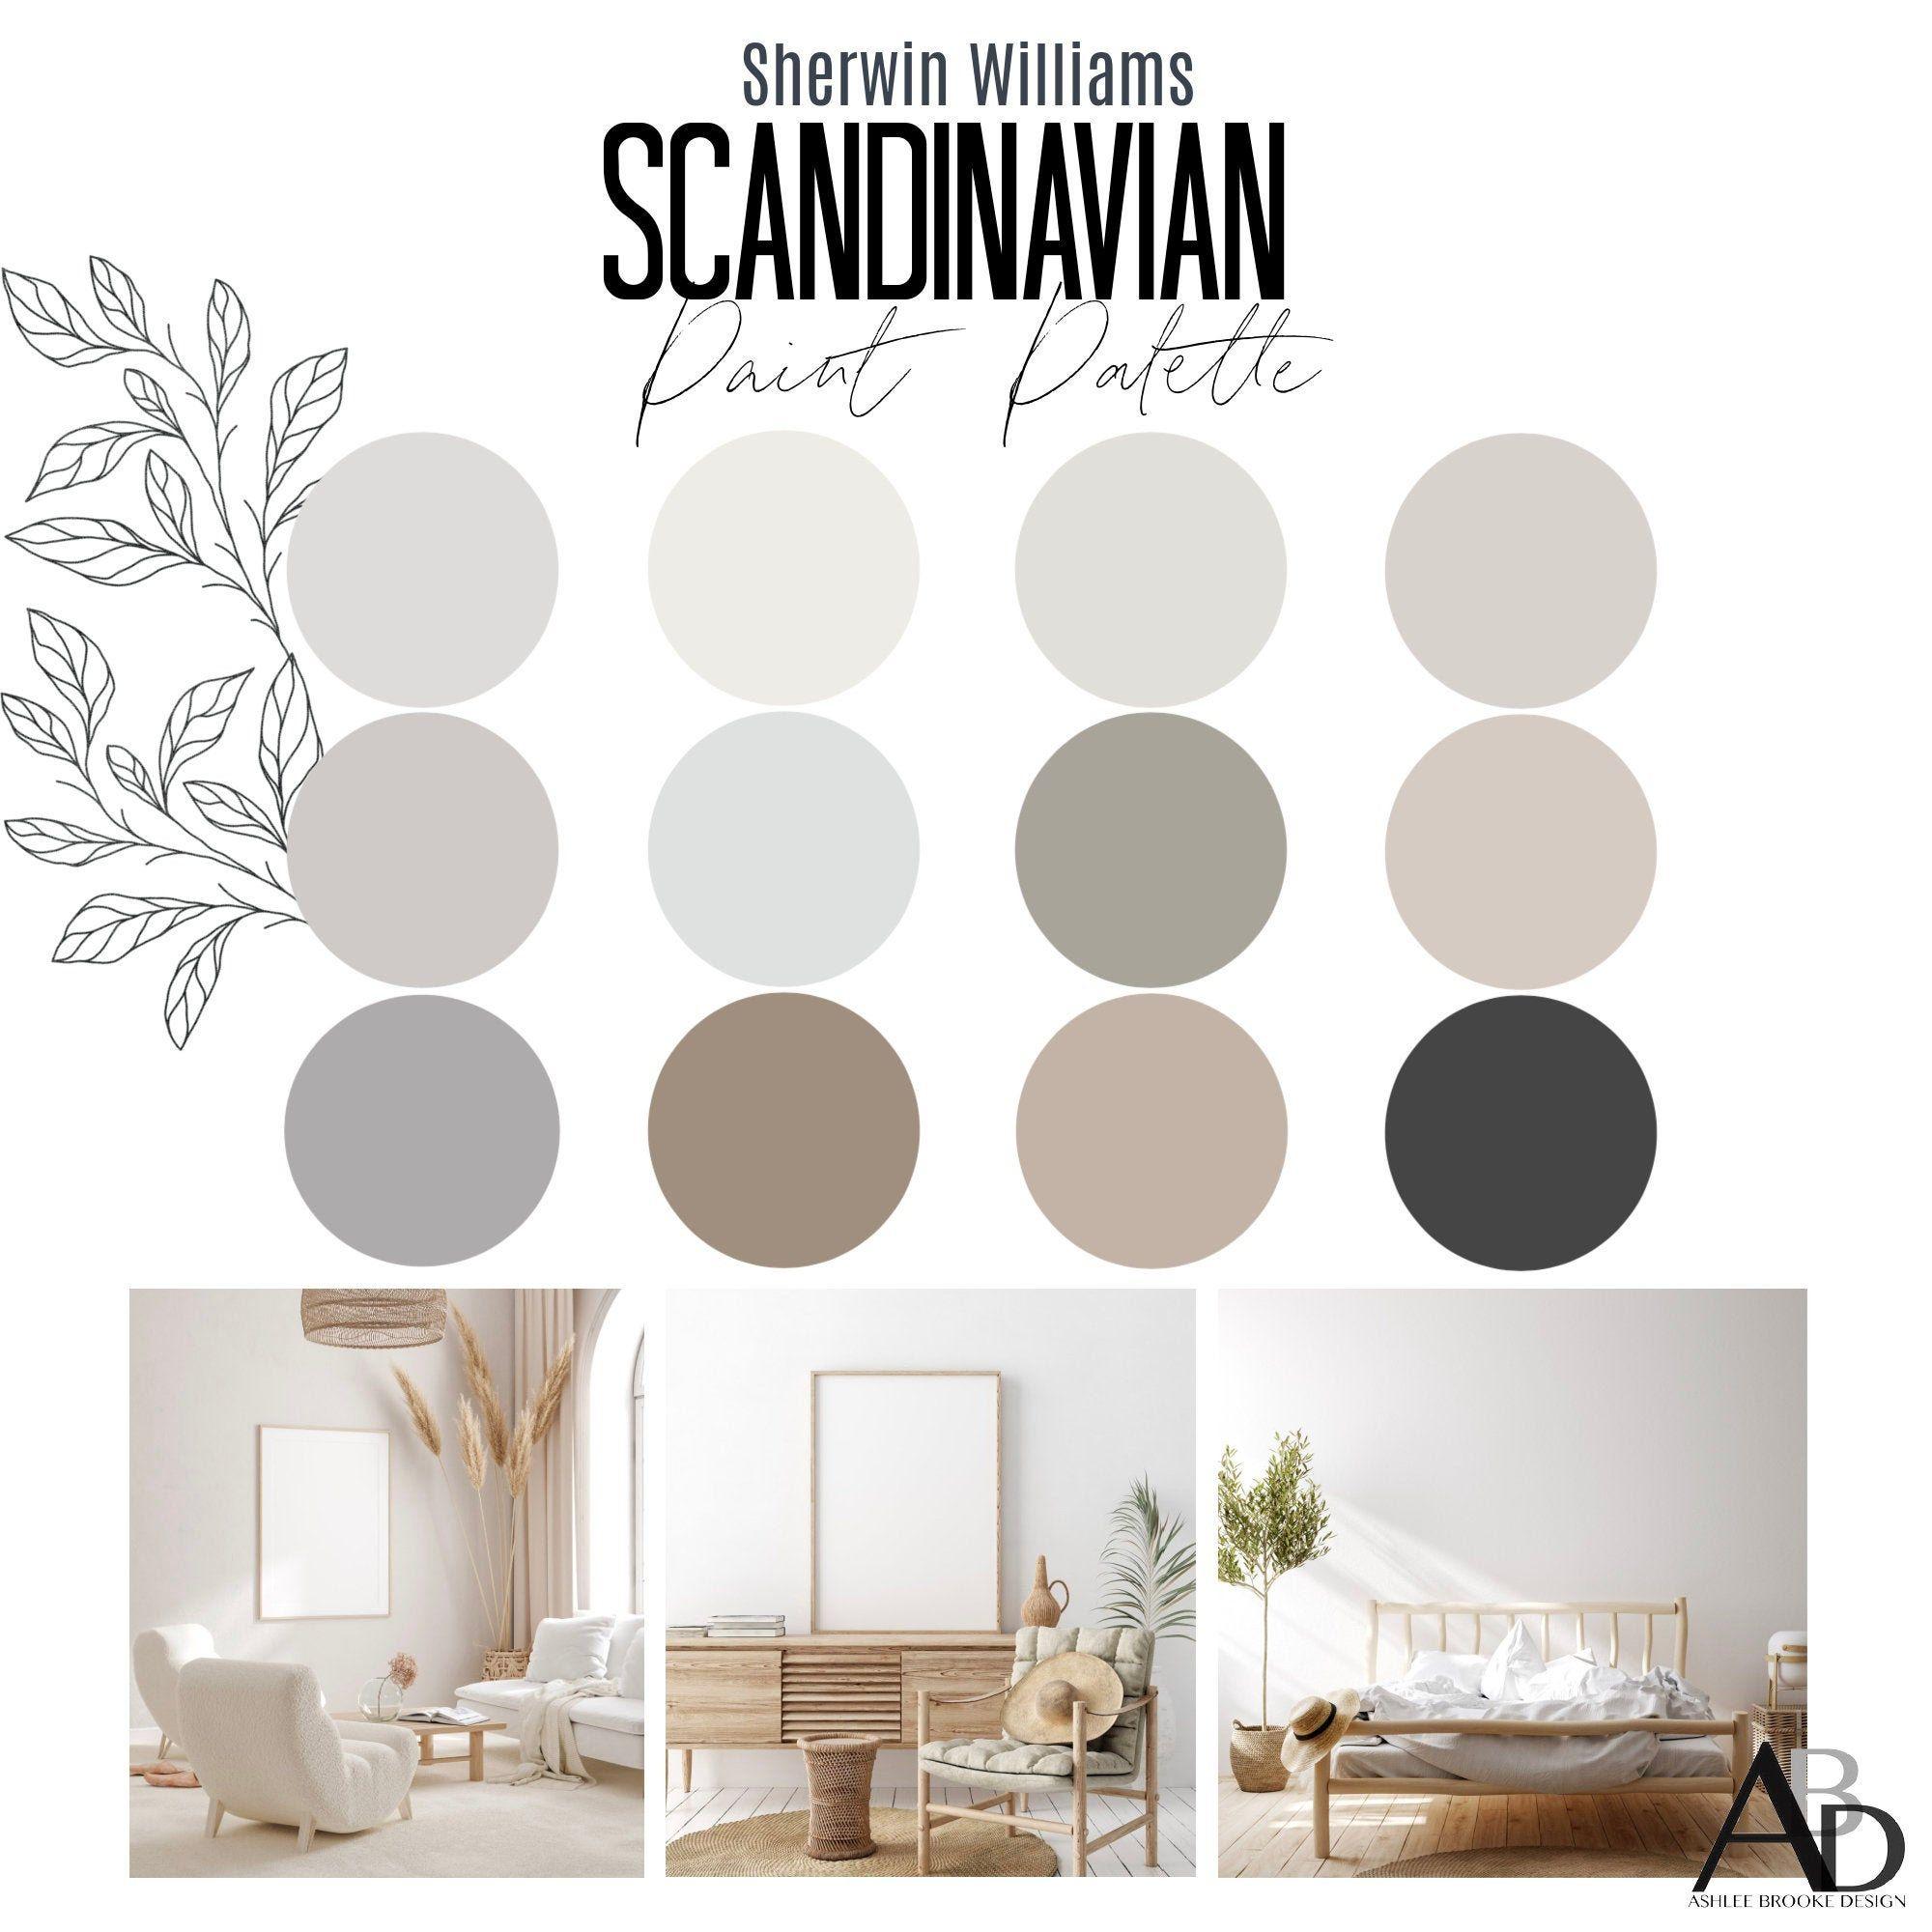 Sherwin Williams SCANDINAVIAN Interior Paint Palette - Interior Designer Selected -  Professional Paint Color Selection - Paint Palette